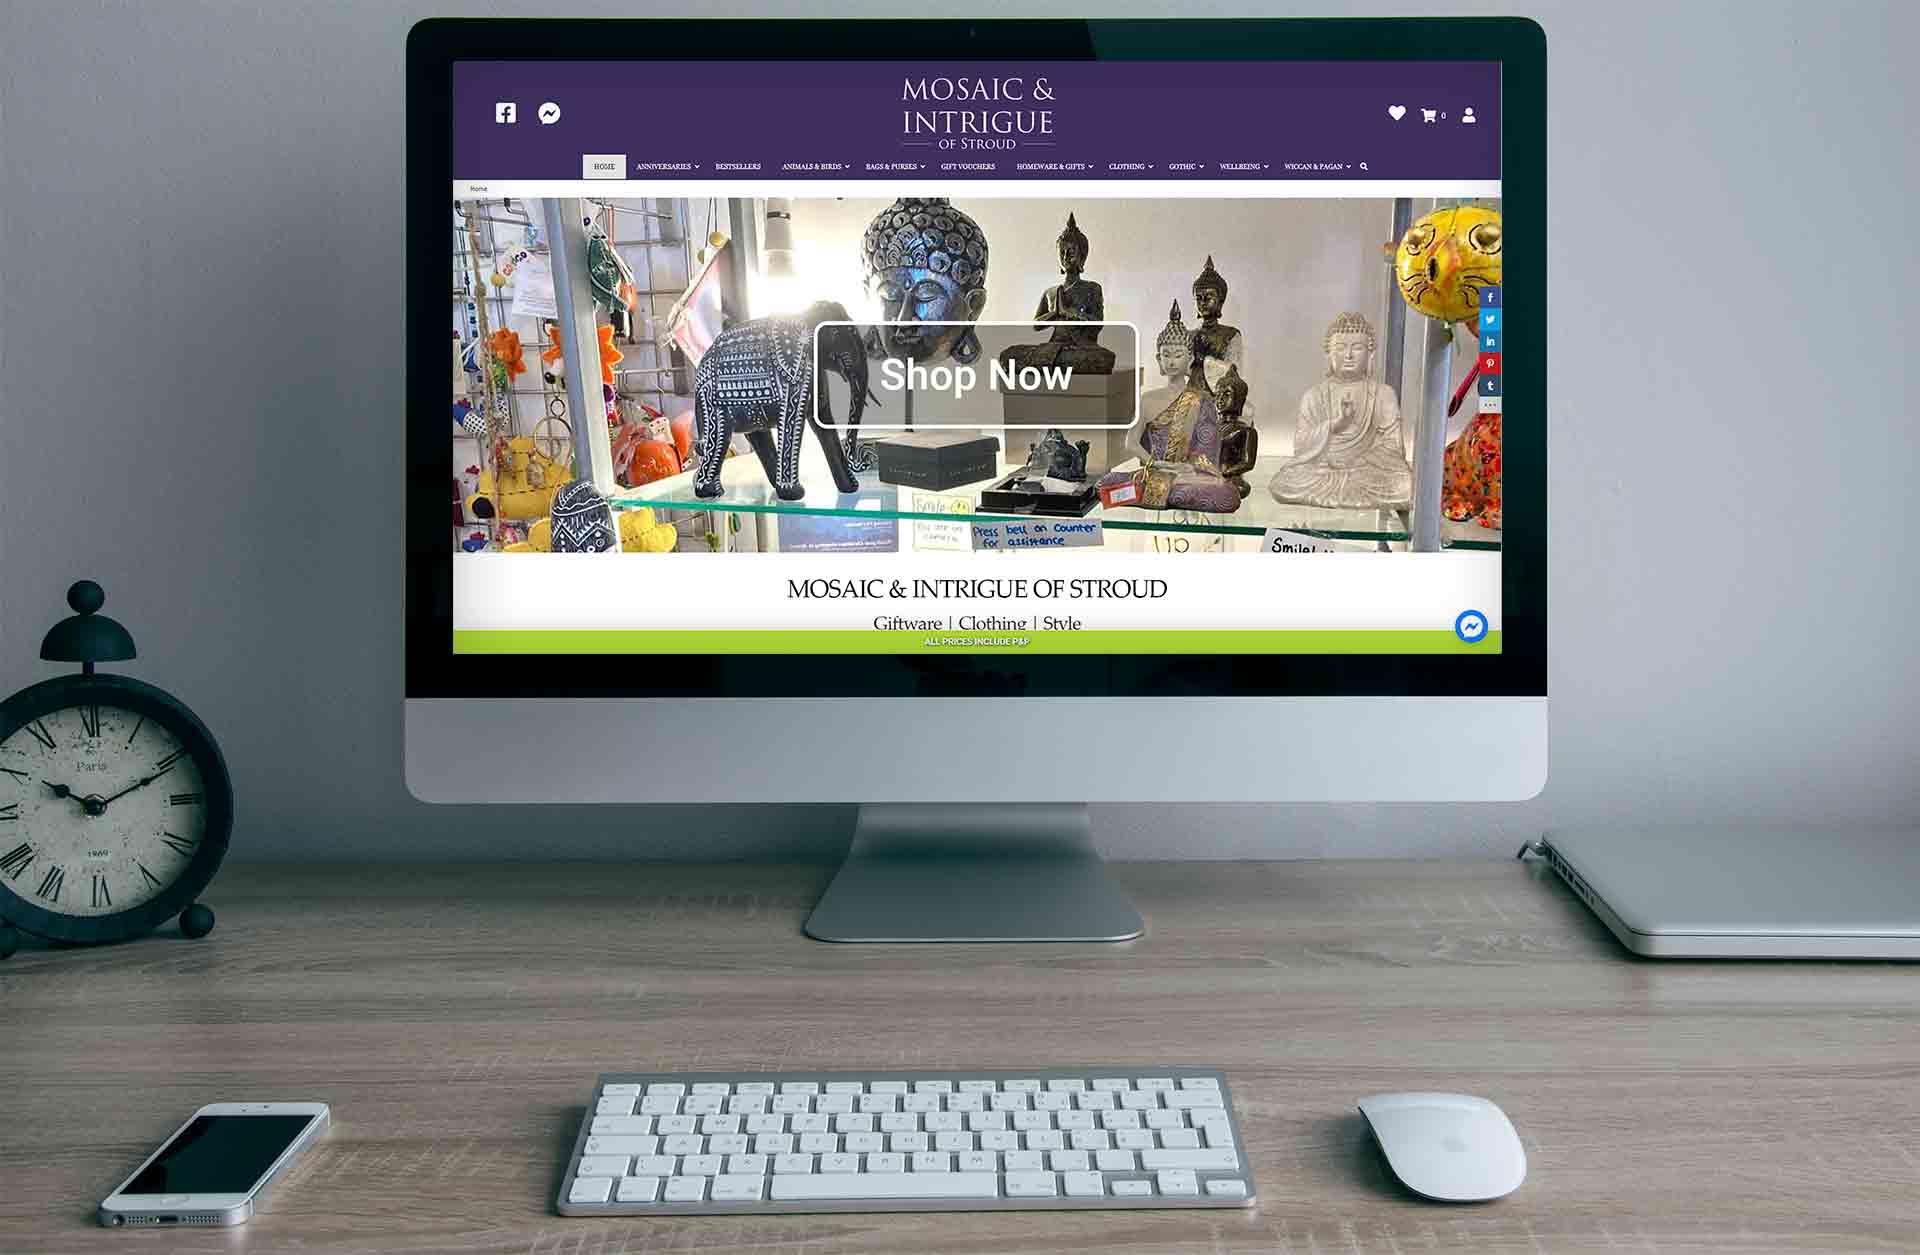 Web Design For Retailers